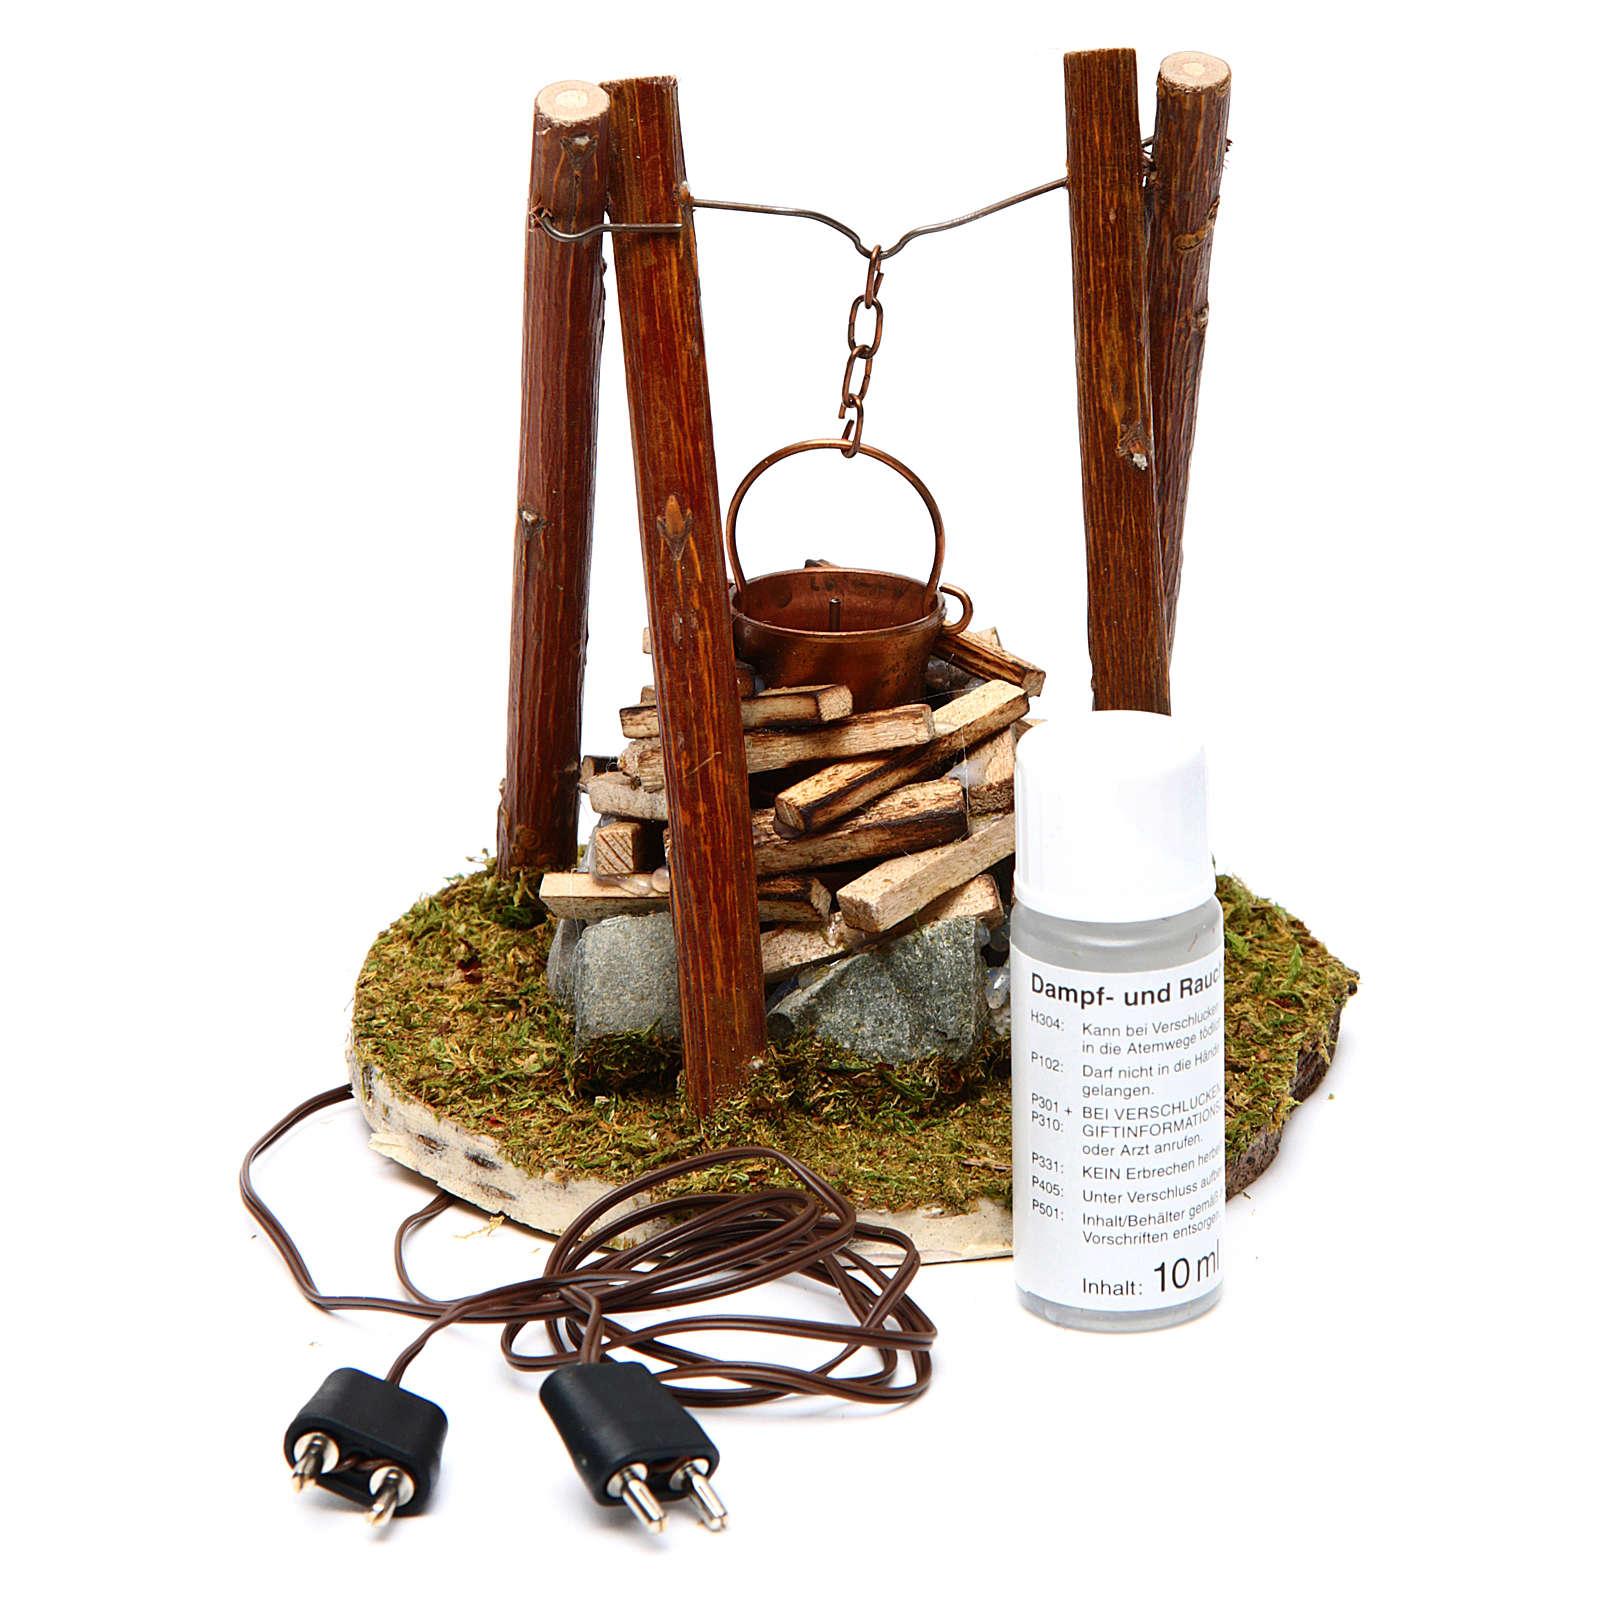 Wood and stone bonfire nativity scene accessory 10x10x10 cm 4